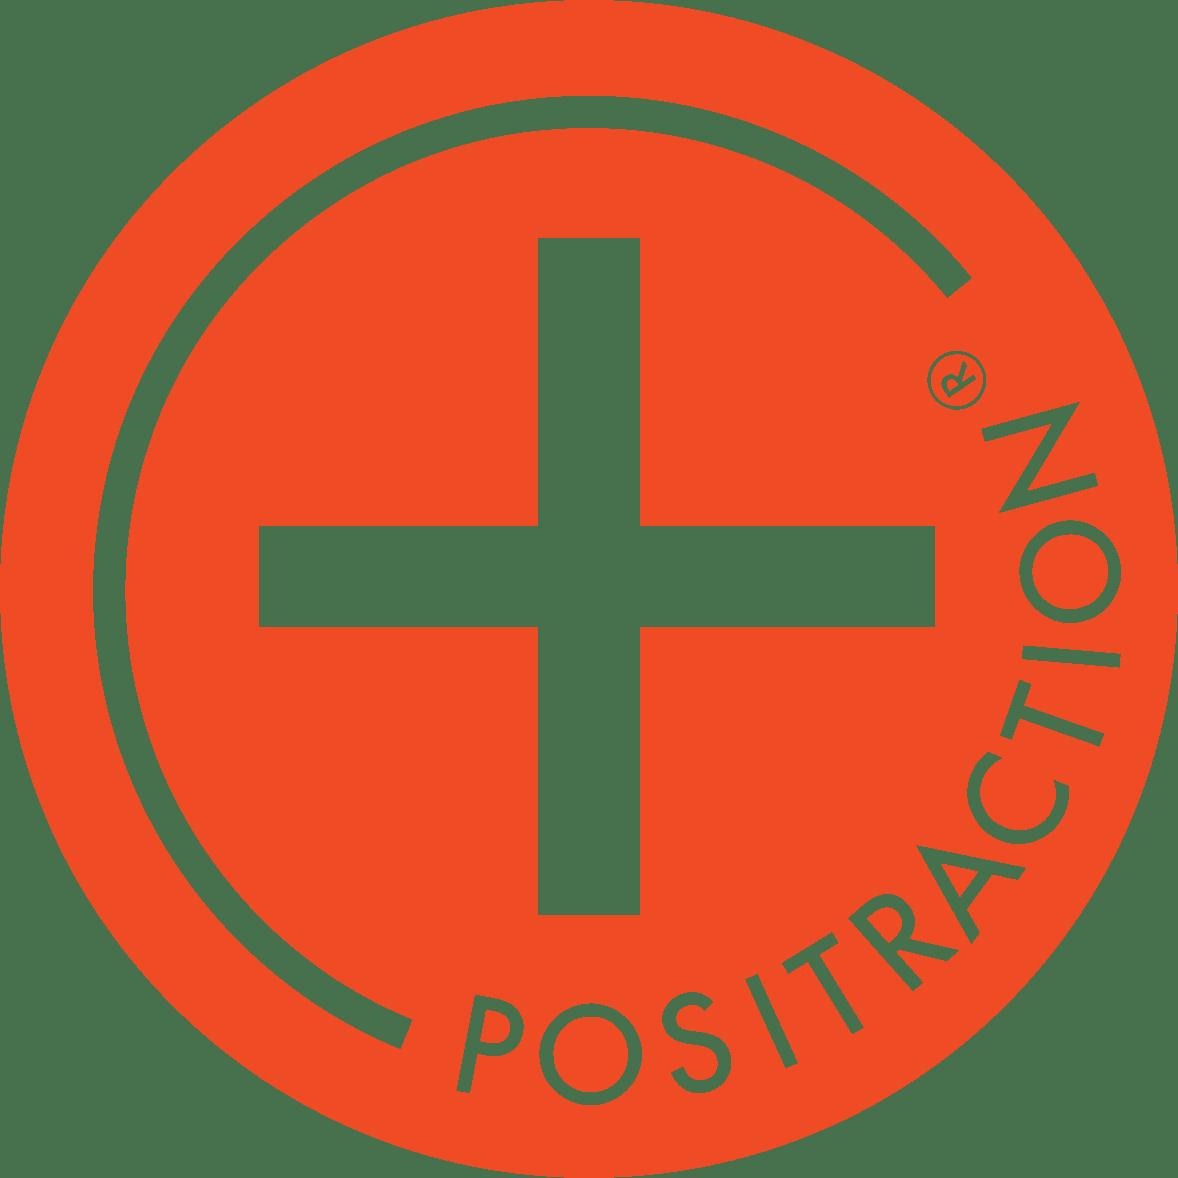 Positraction logo- marketing firm